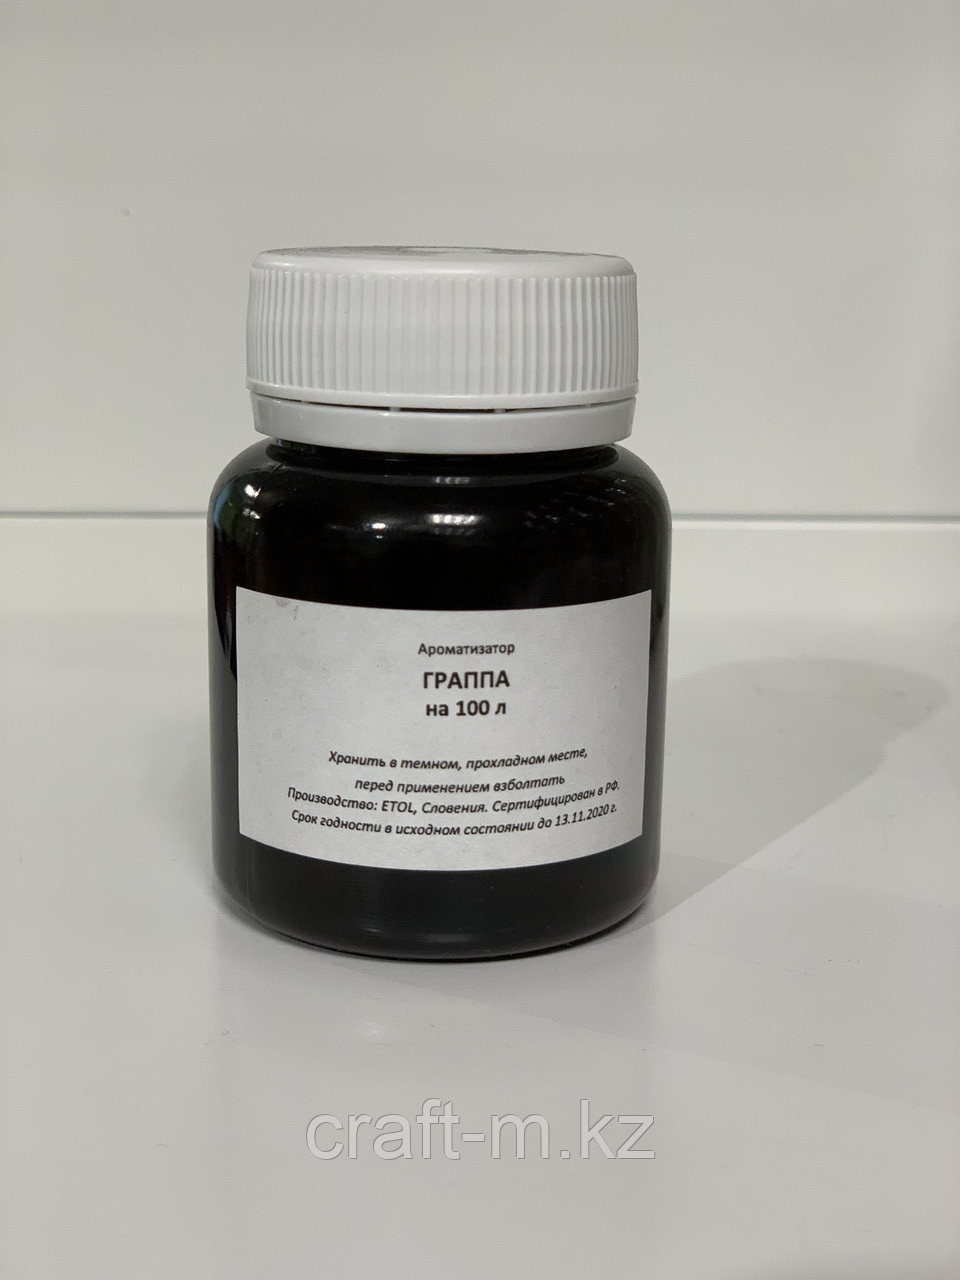 Граппа - ароматизатор на 100л